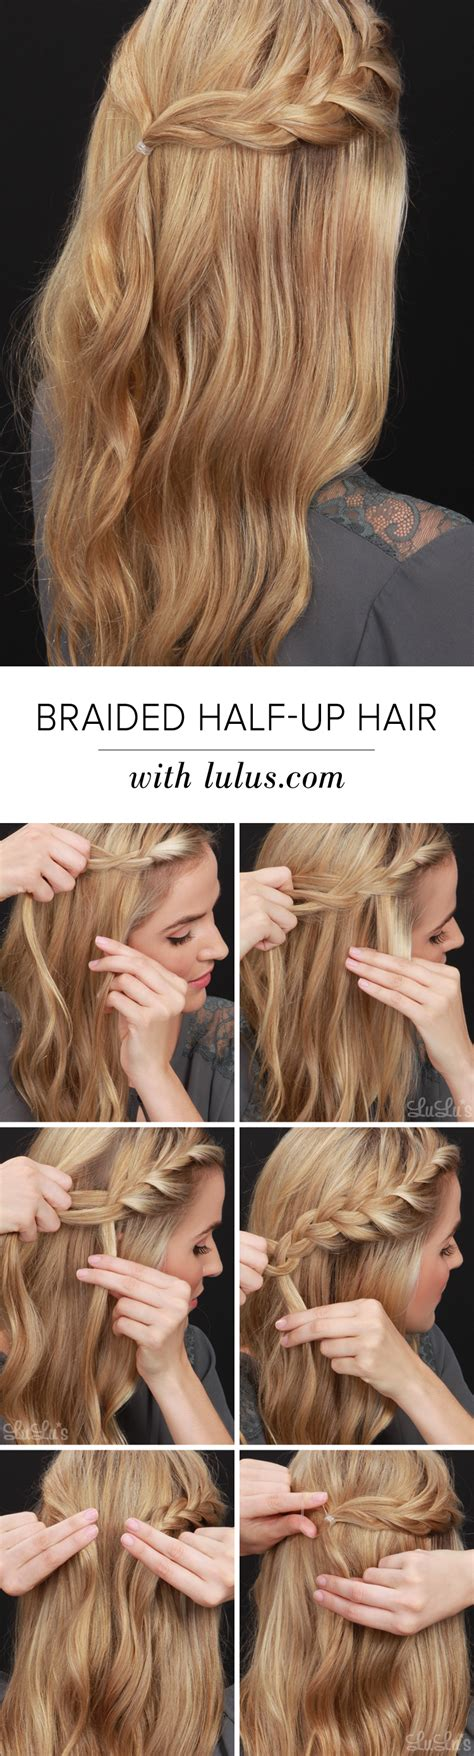 blogger hair tutorial lulus how to half up braided hair tutorial lulus com